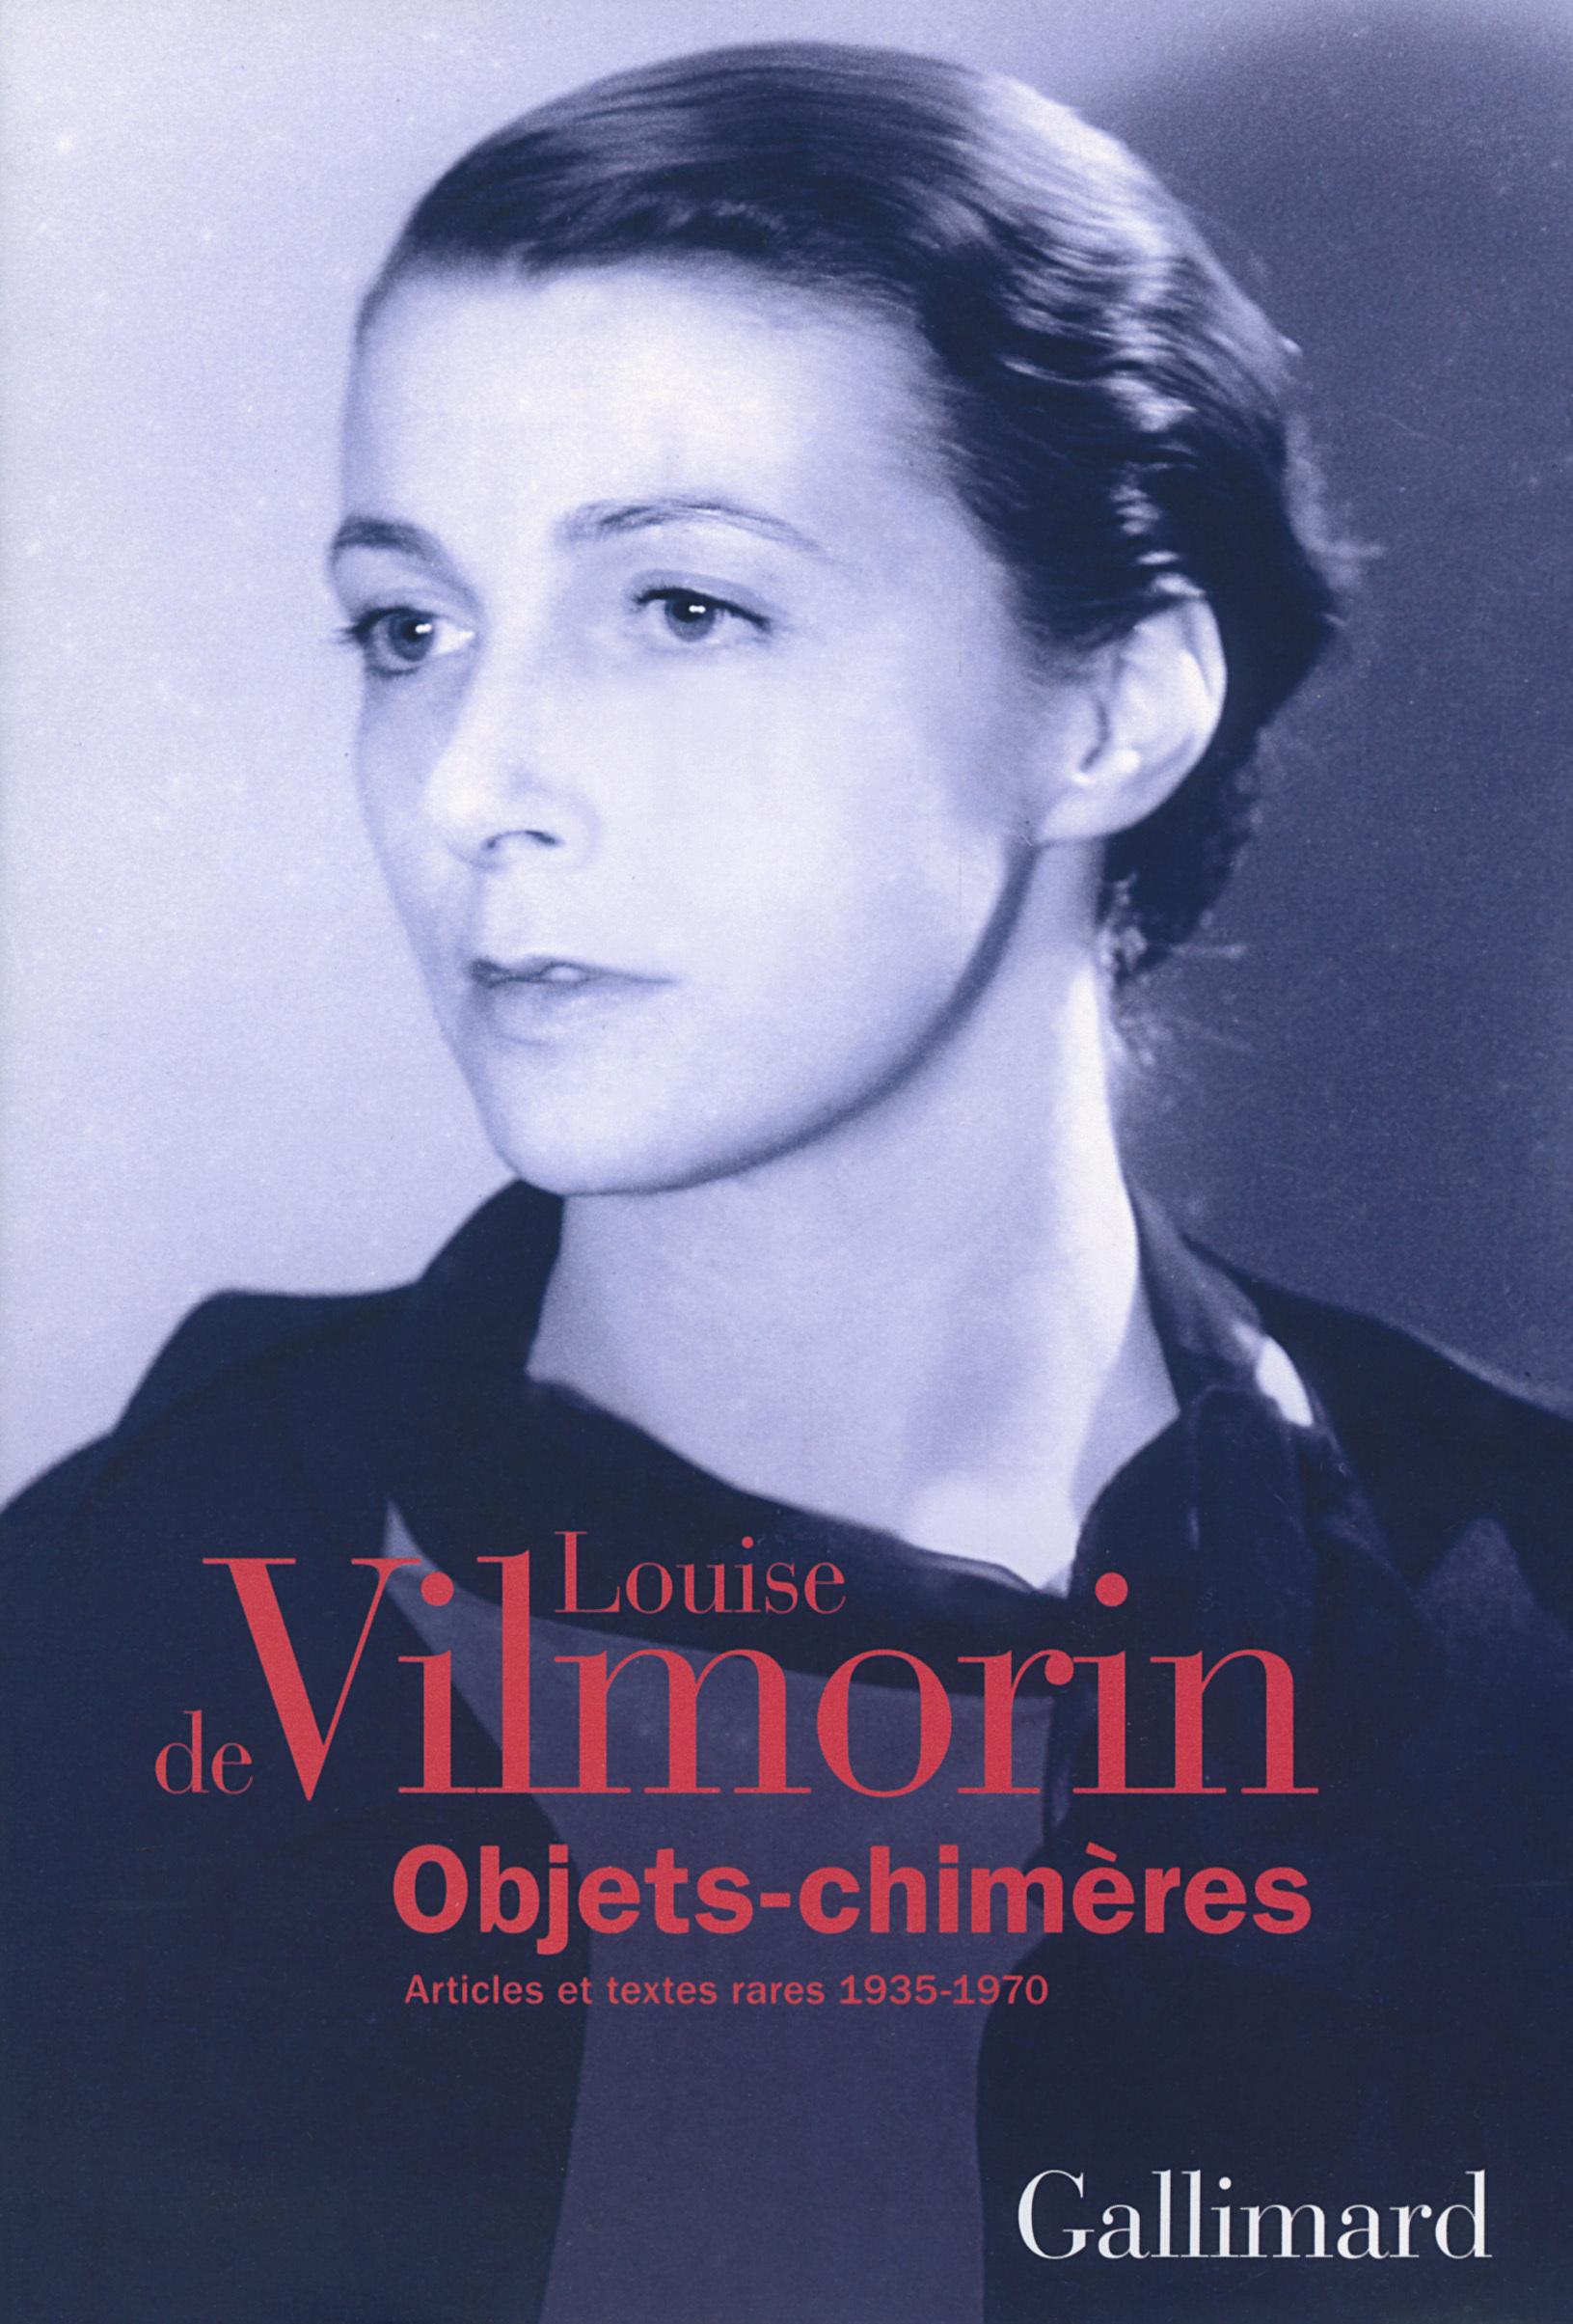 OBJETS-CHIMERES - ARTICLES ET TEXTES RARES (1935-1970)